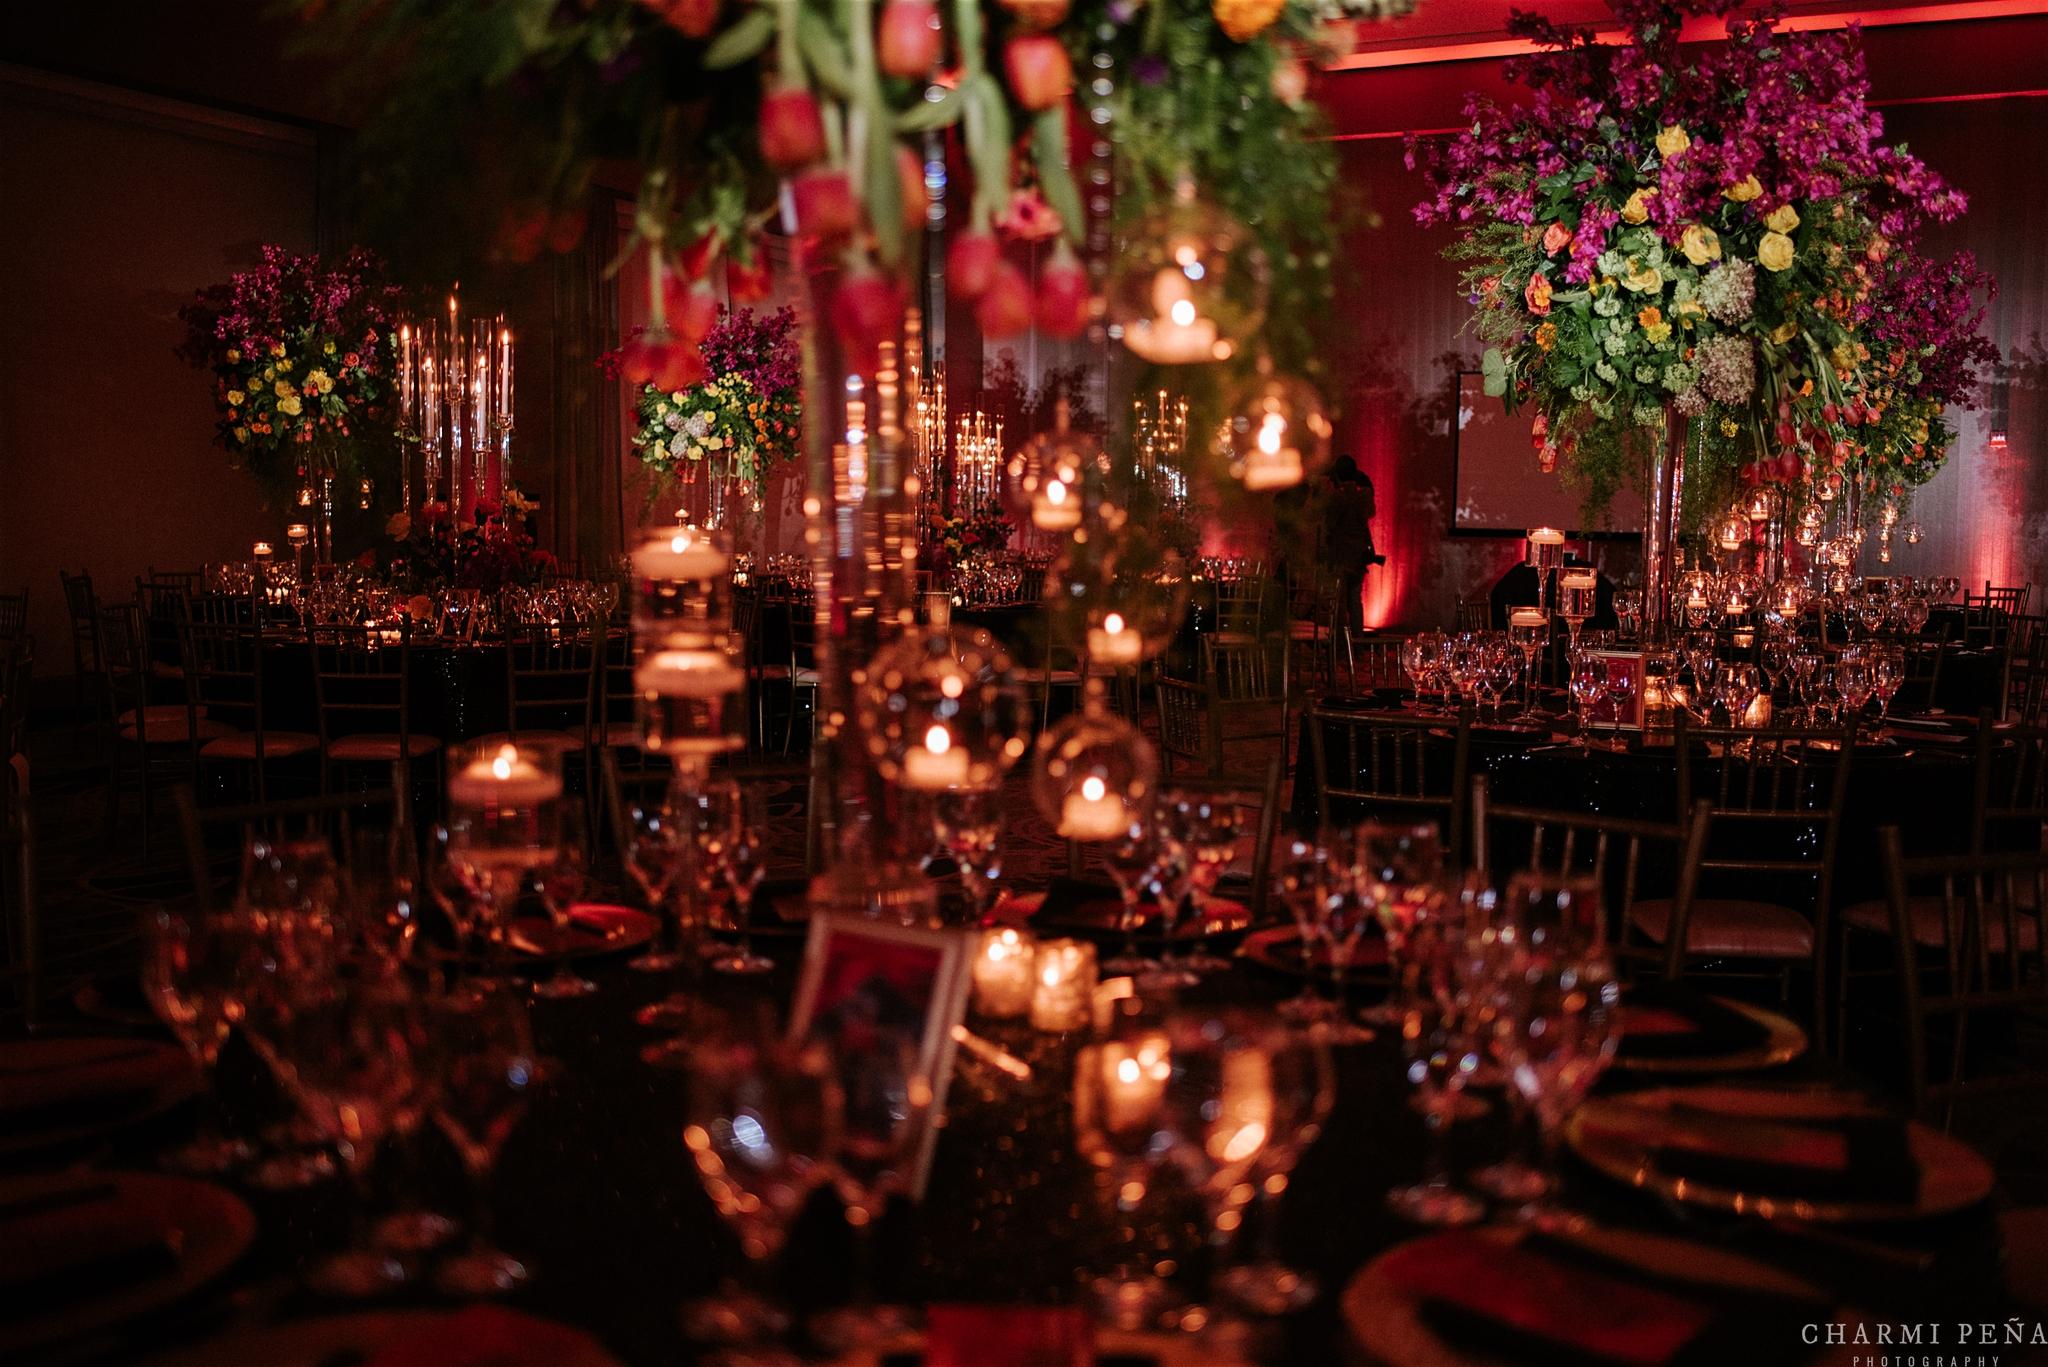 INDIAN WEDDING TABLE DECOR.jpg